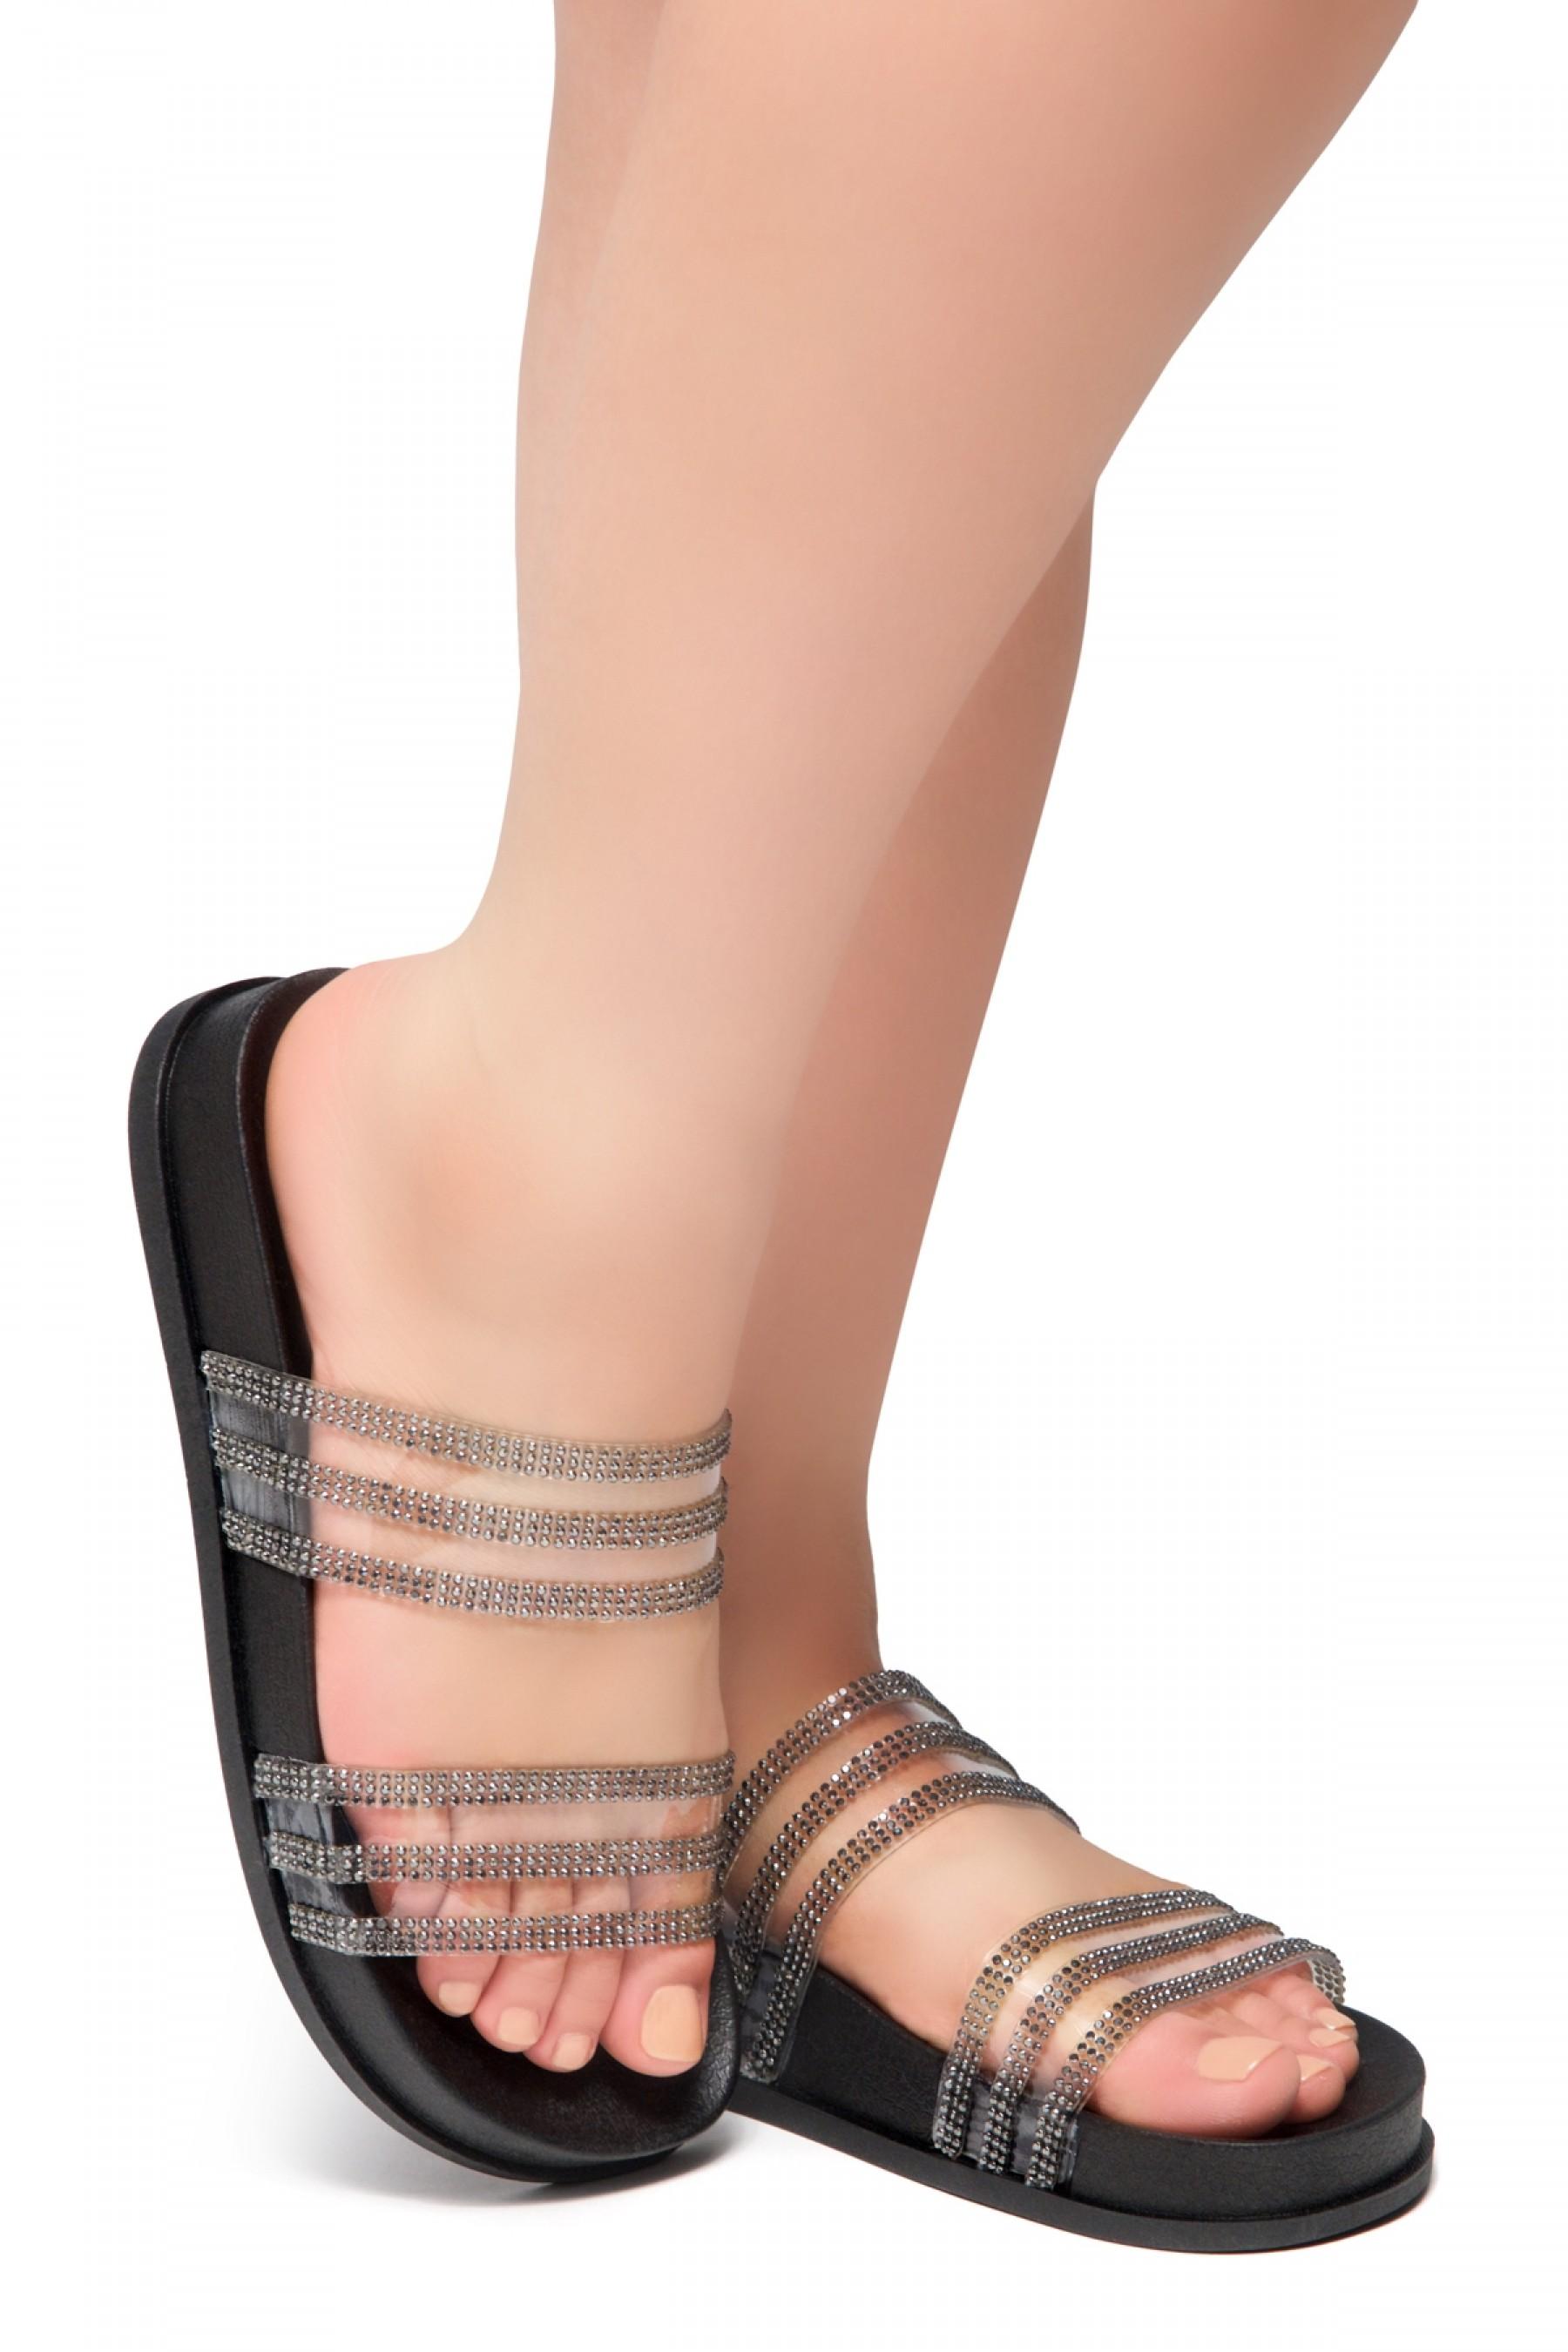 HerStyle Corey-Open Toe Open Back Jewelled Embellishment Slide Sandal (Black)